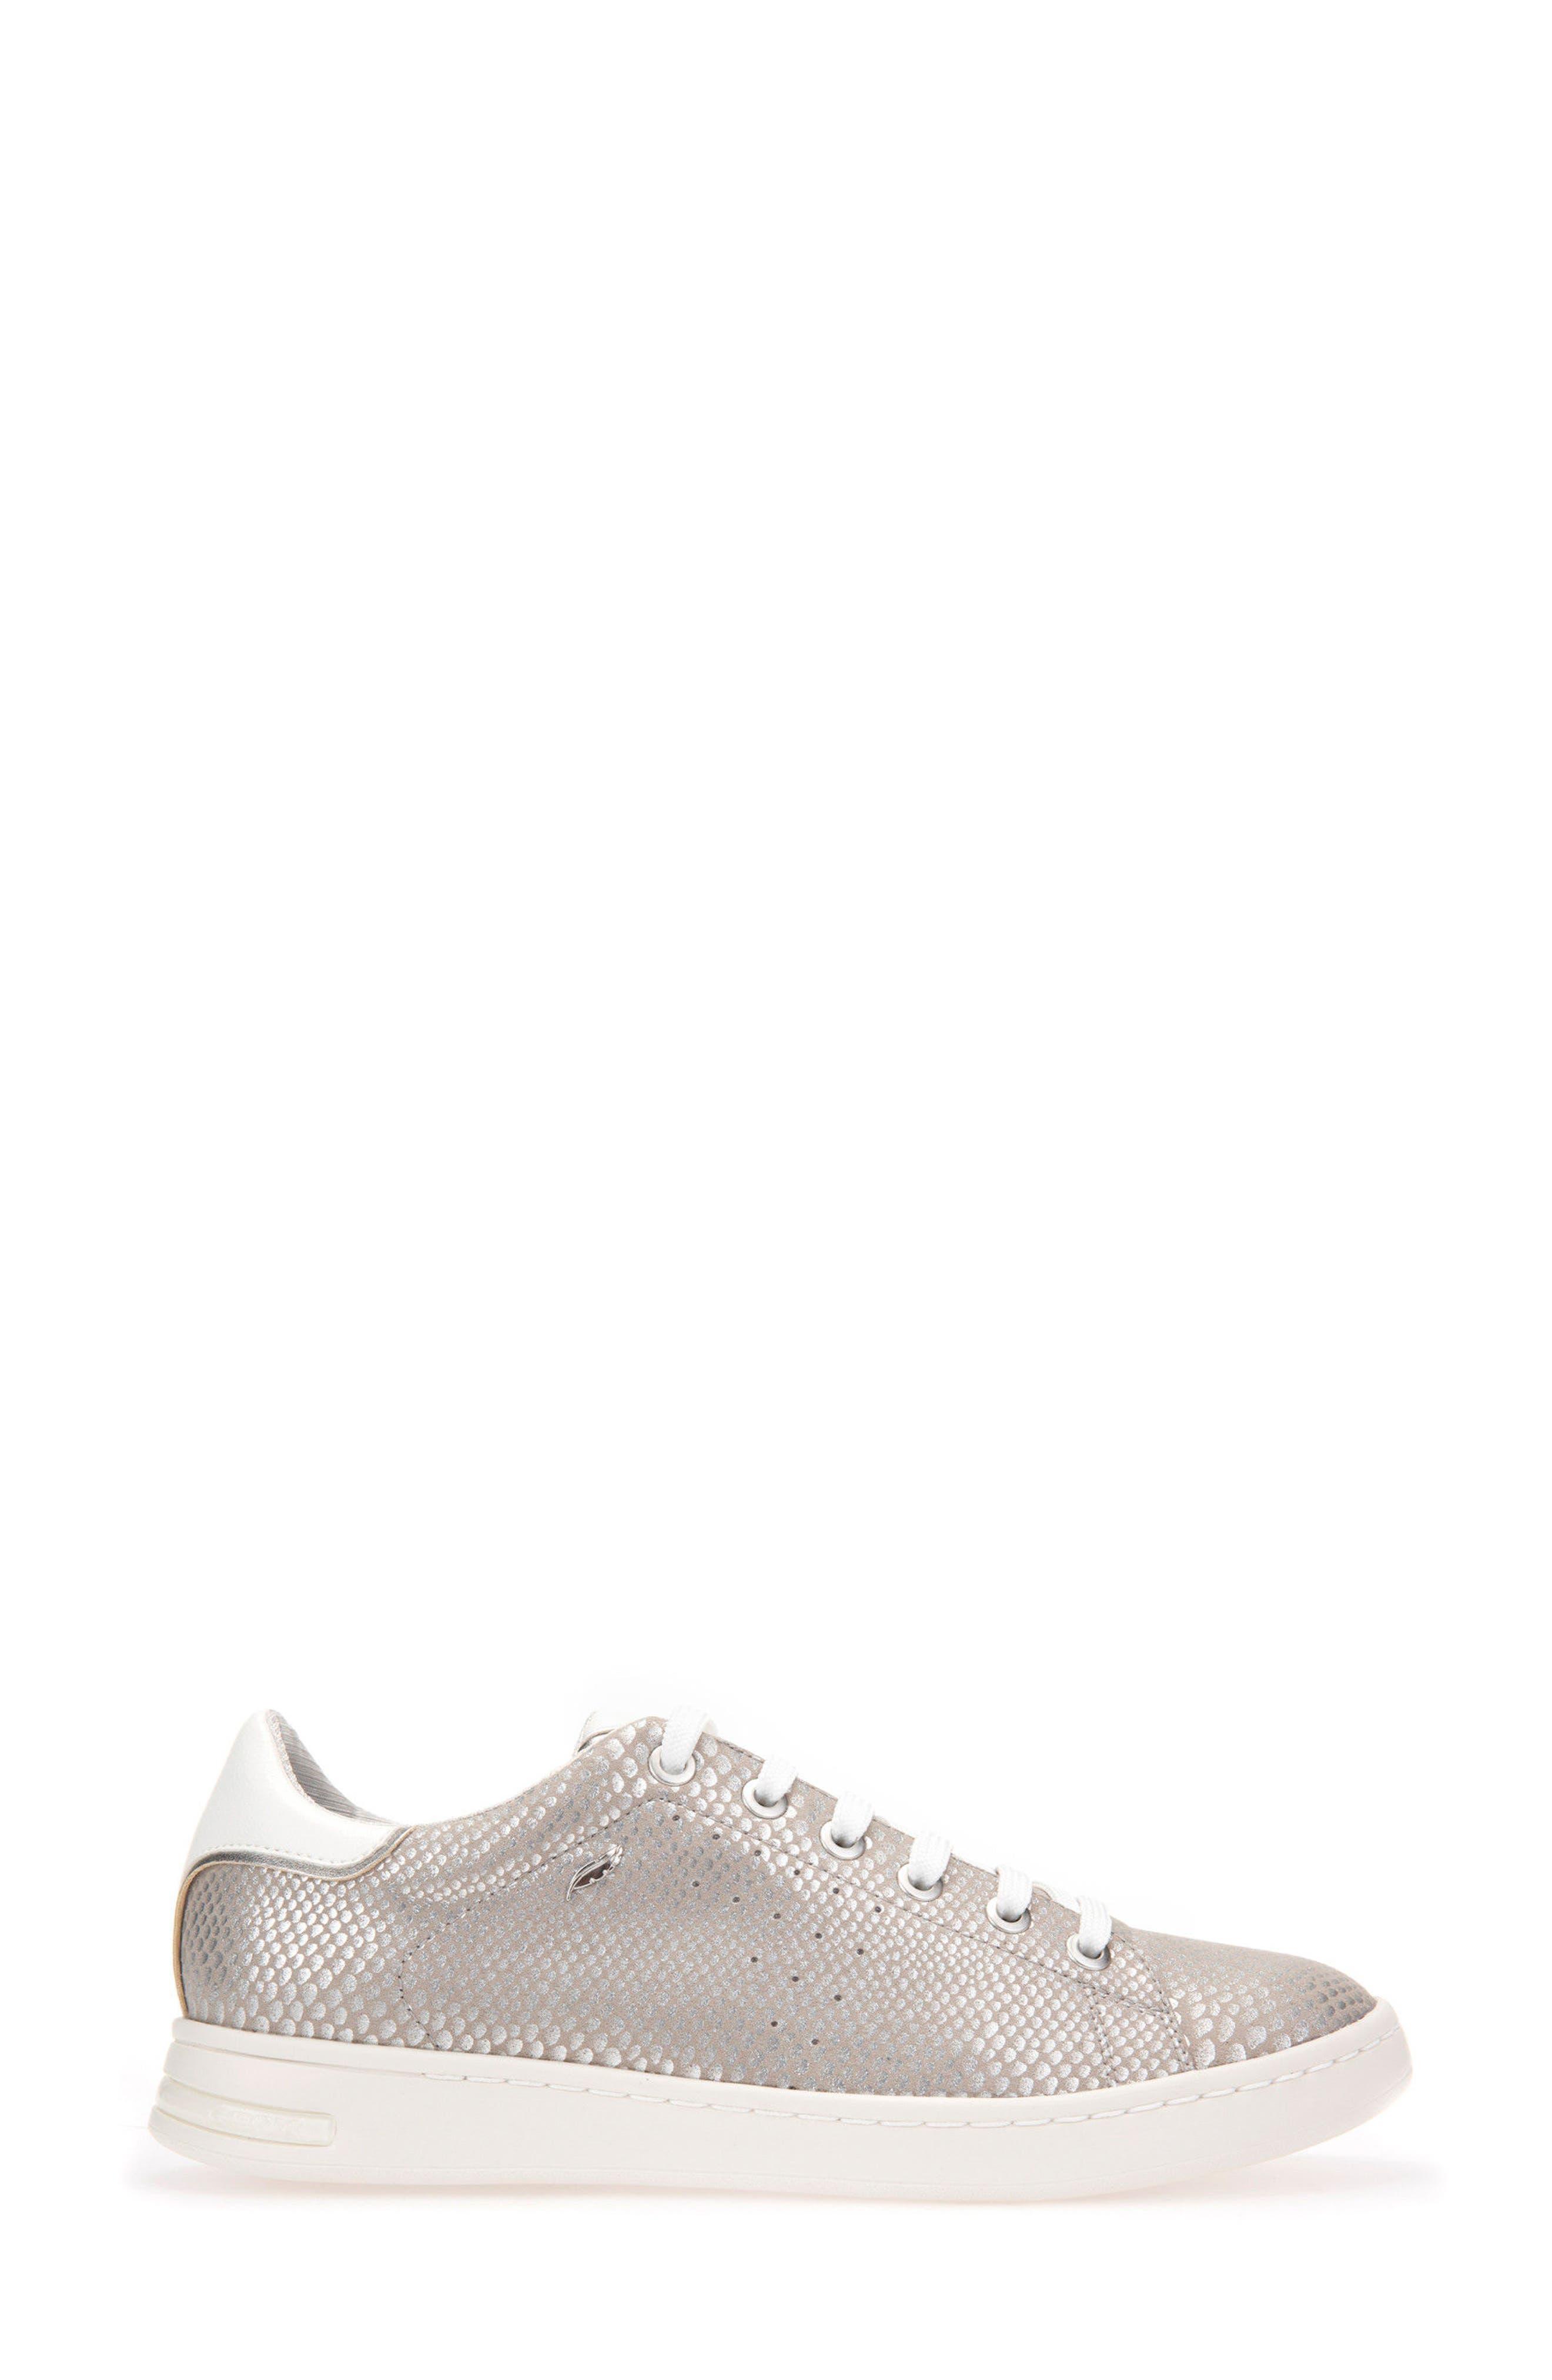 Jaysen Sneaker,                             Alternate thumbnail 3, color,                             SILVER FABRIC